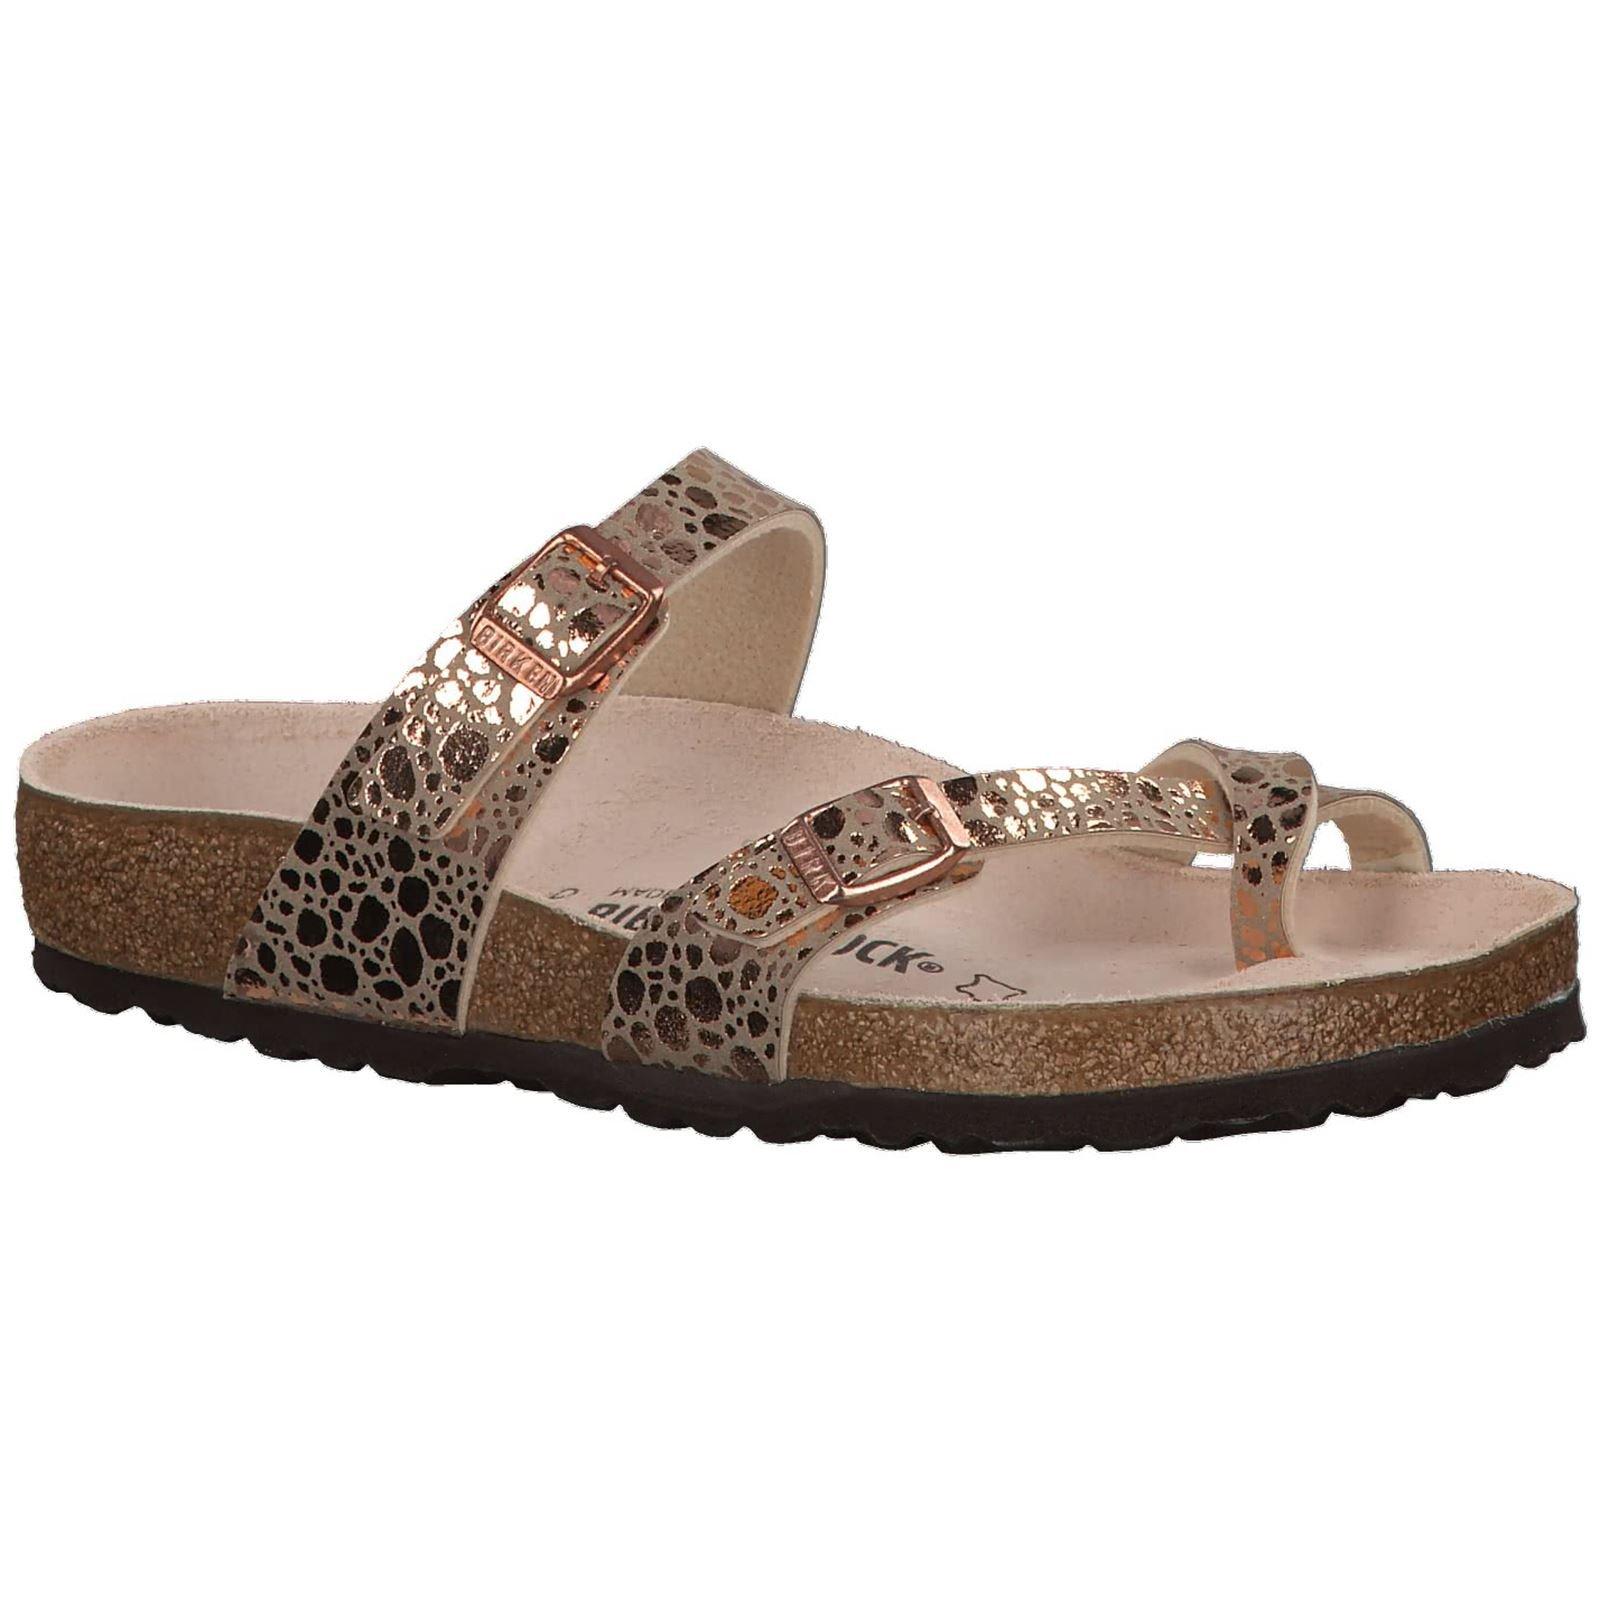 Birkenstock Womens Mayari Metallic Stones Copper Birko-Flor Sandals 39 EU